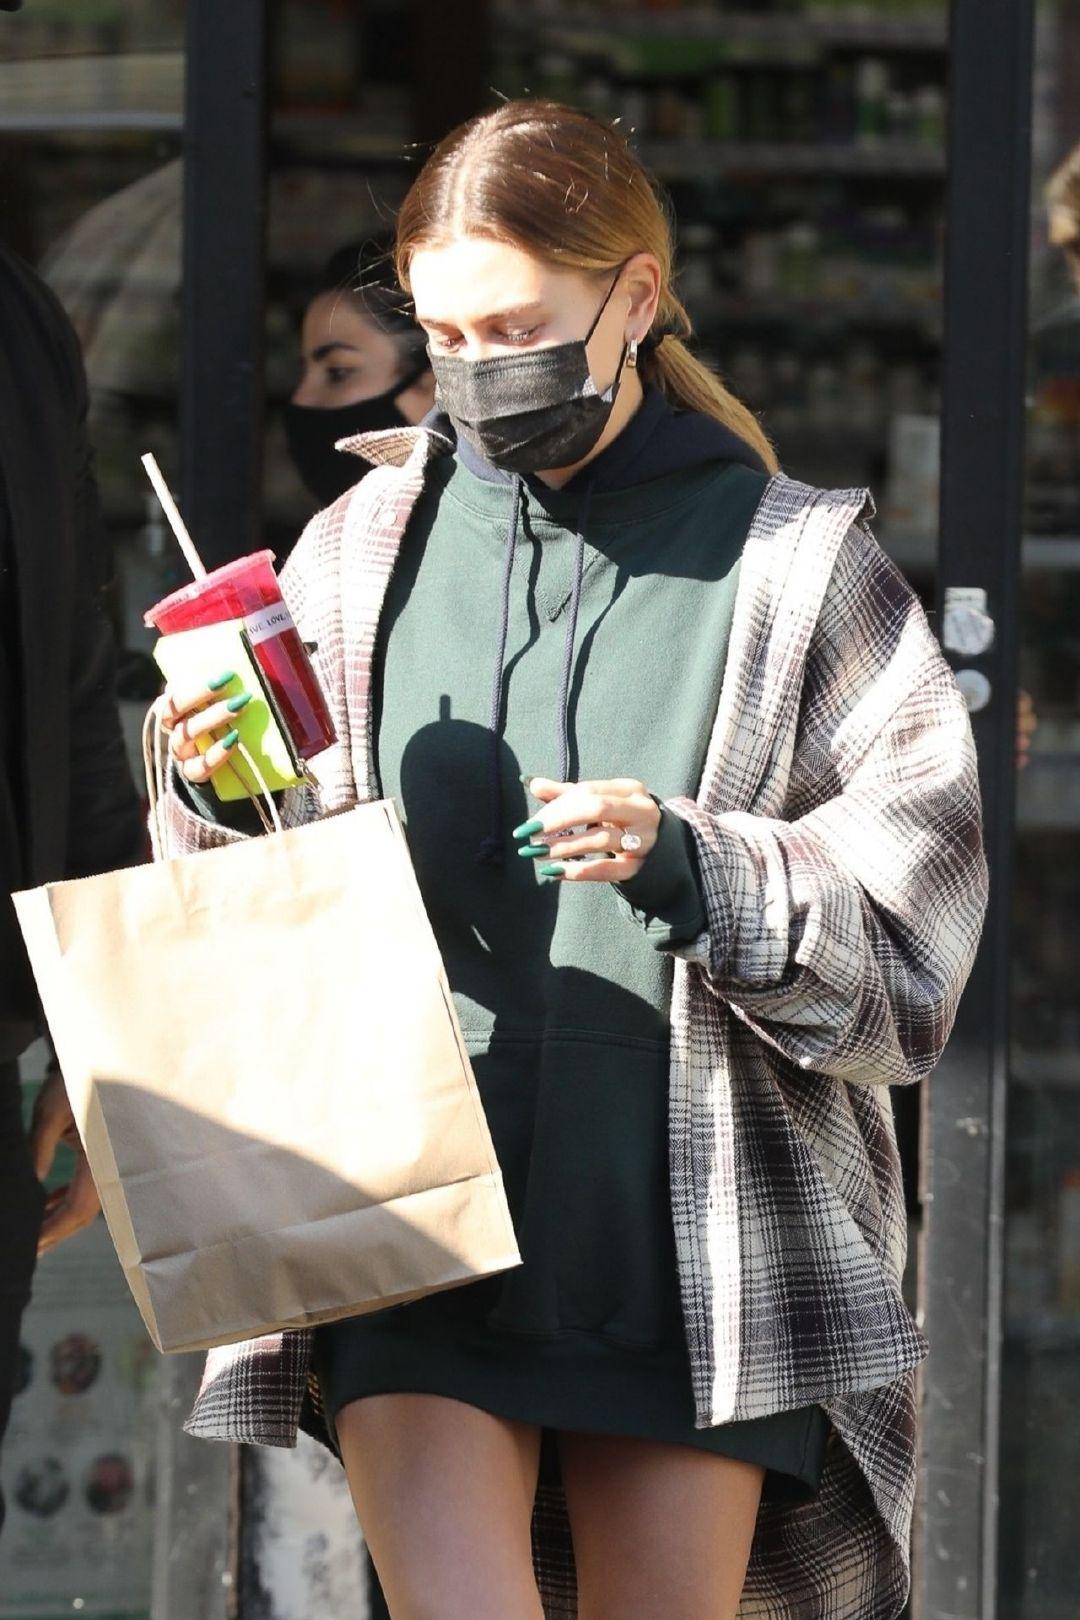 海莉·比伯(Hailey Bieber)在西好莱坞10/27/2020   Hailey Rhode B